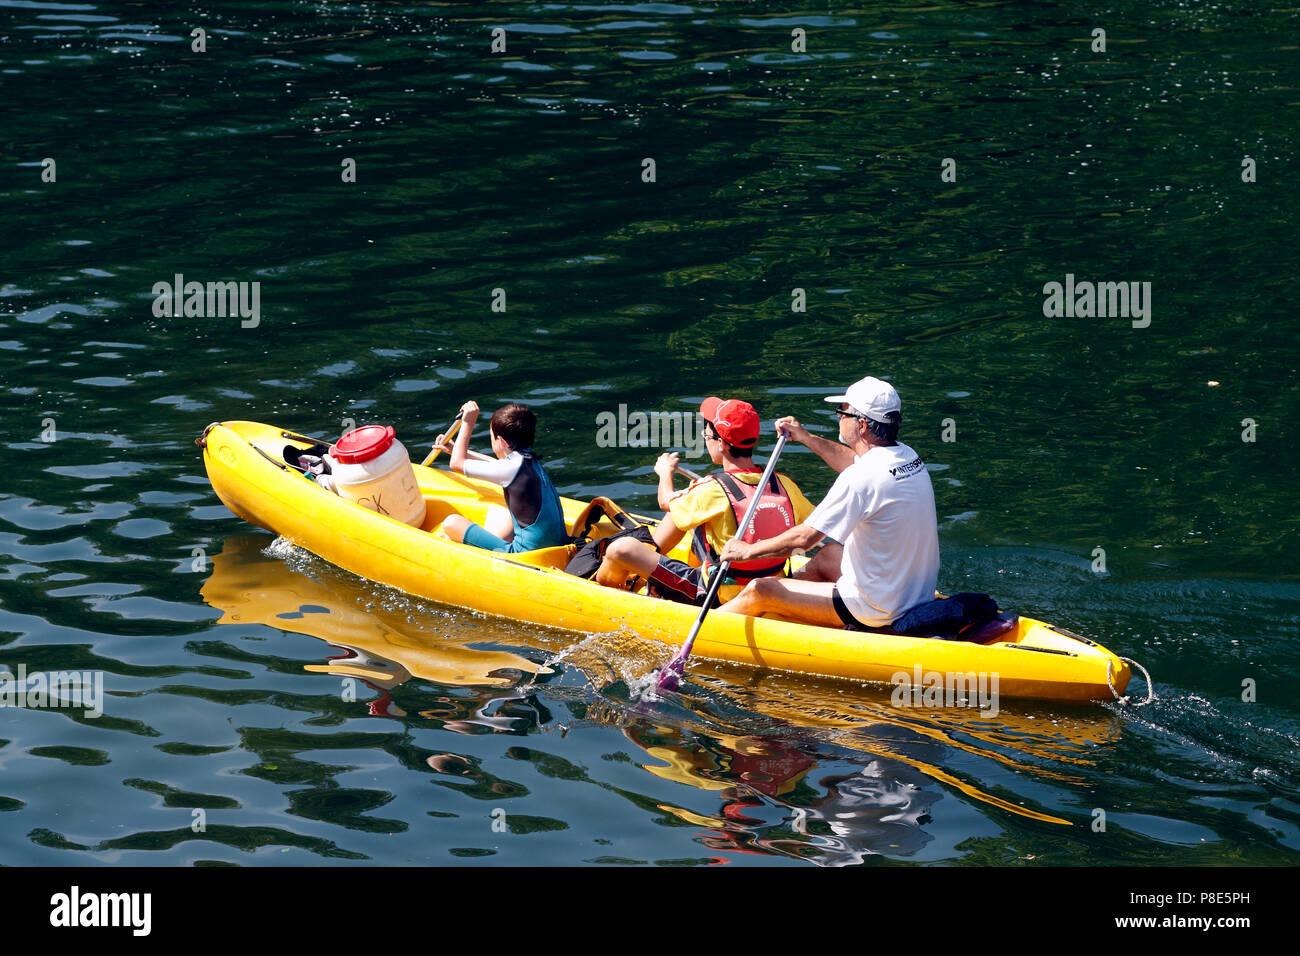 Discese in canoa sul fiume Herault, Laroque, Occitanie Francia Immagini Stock